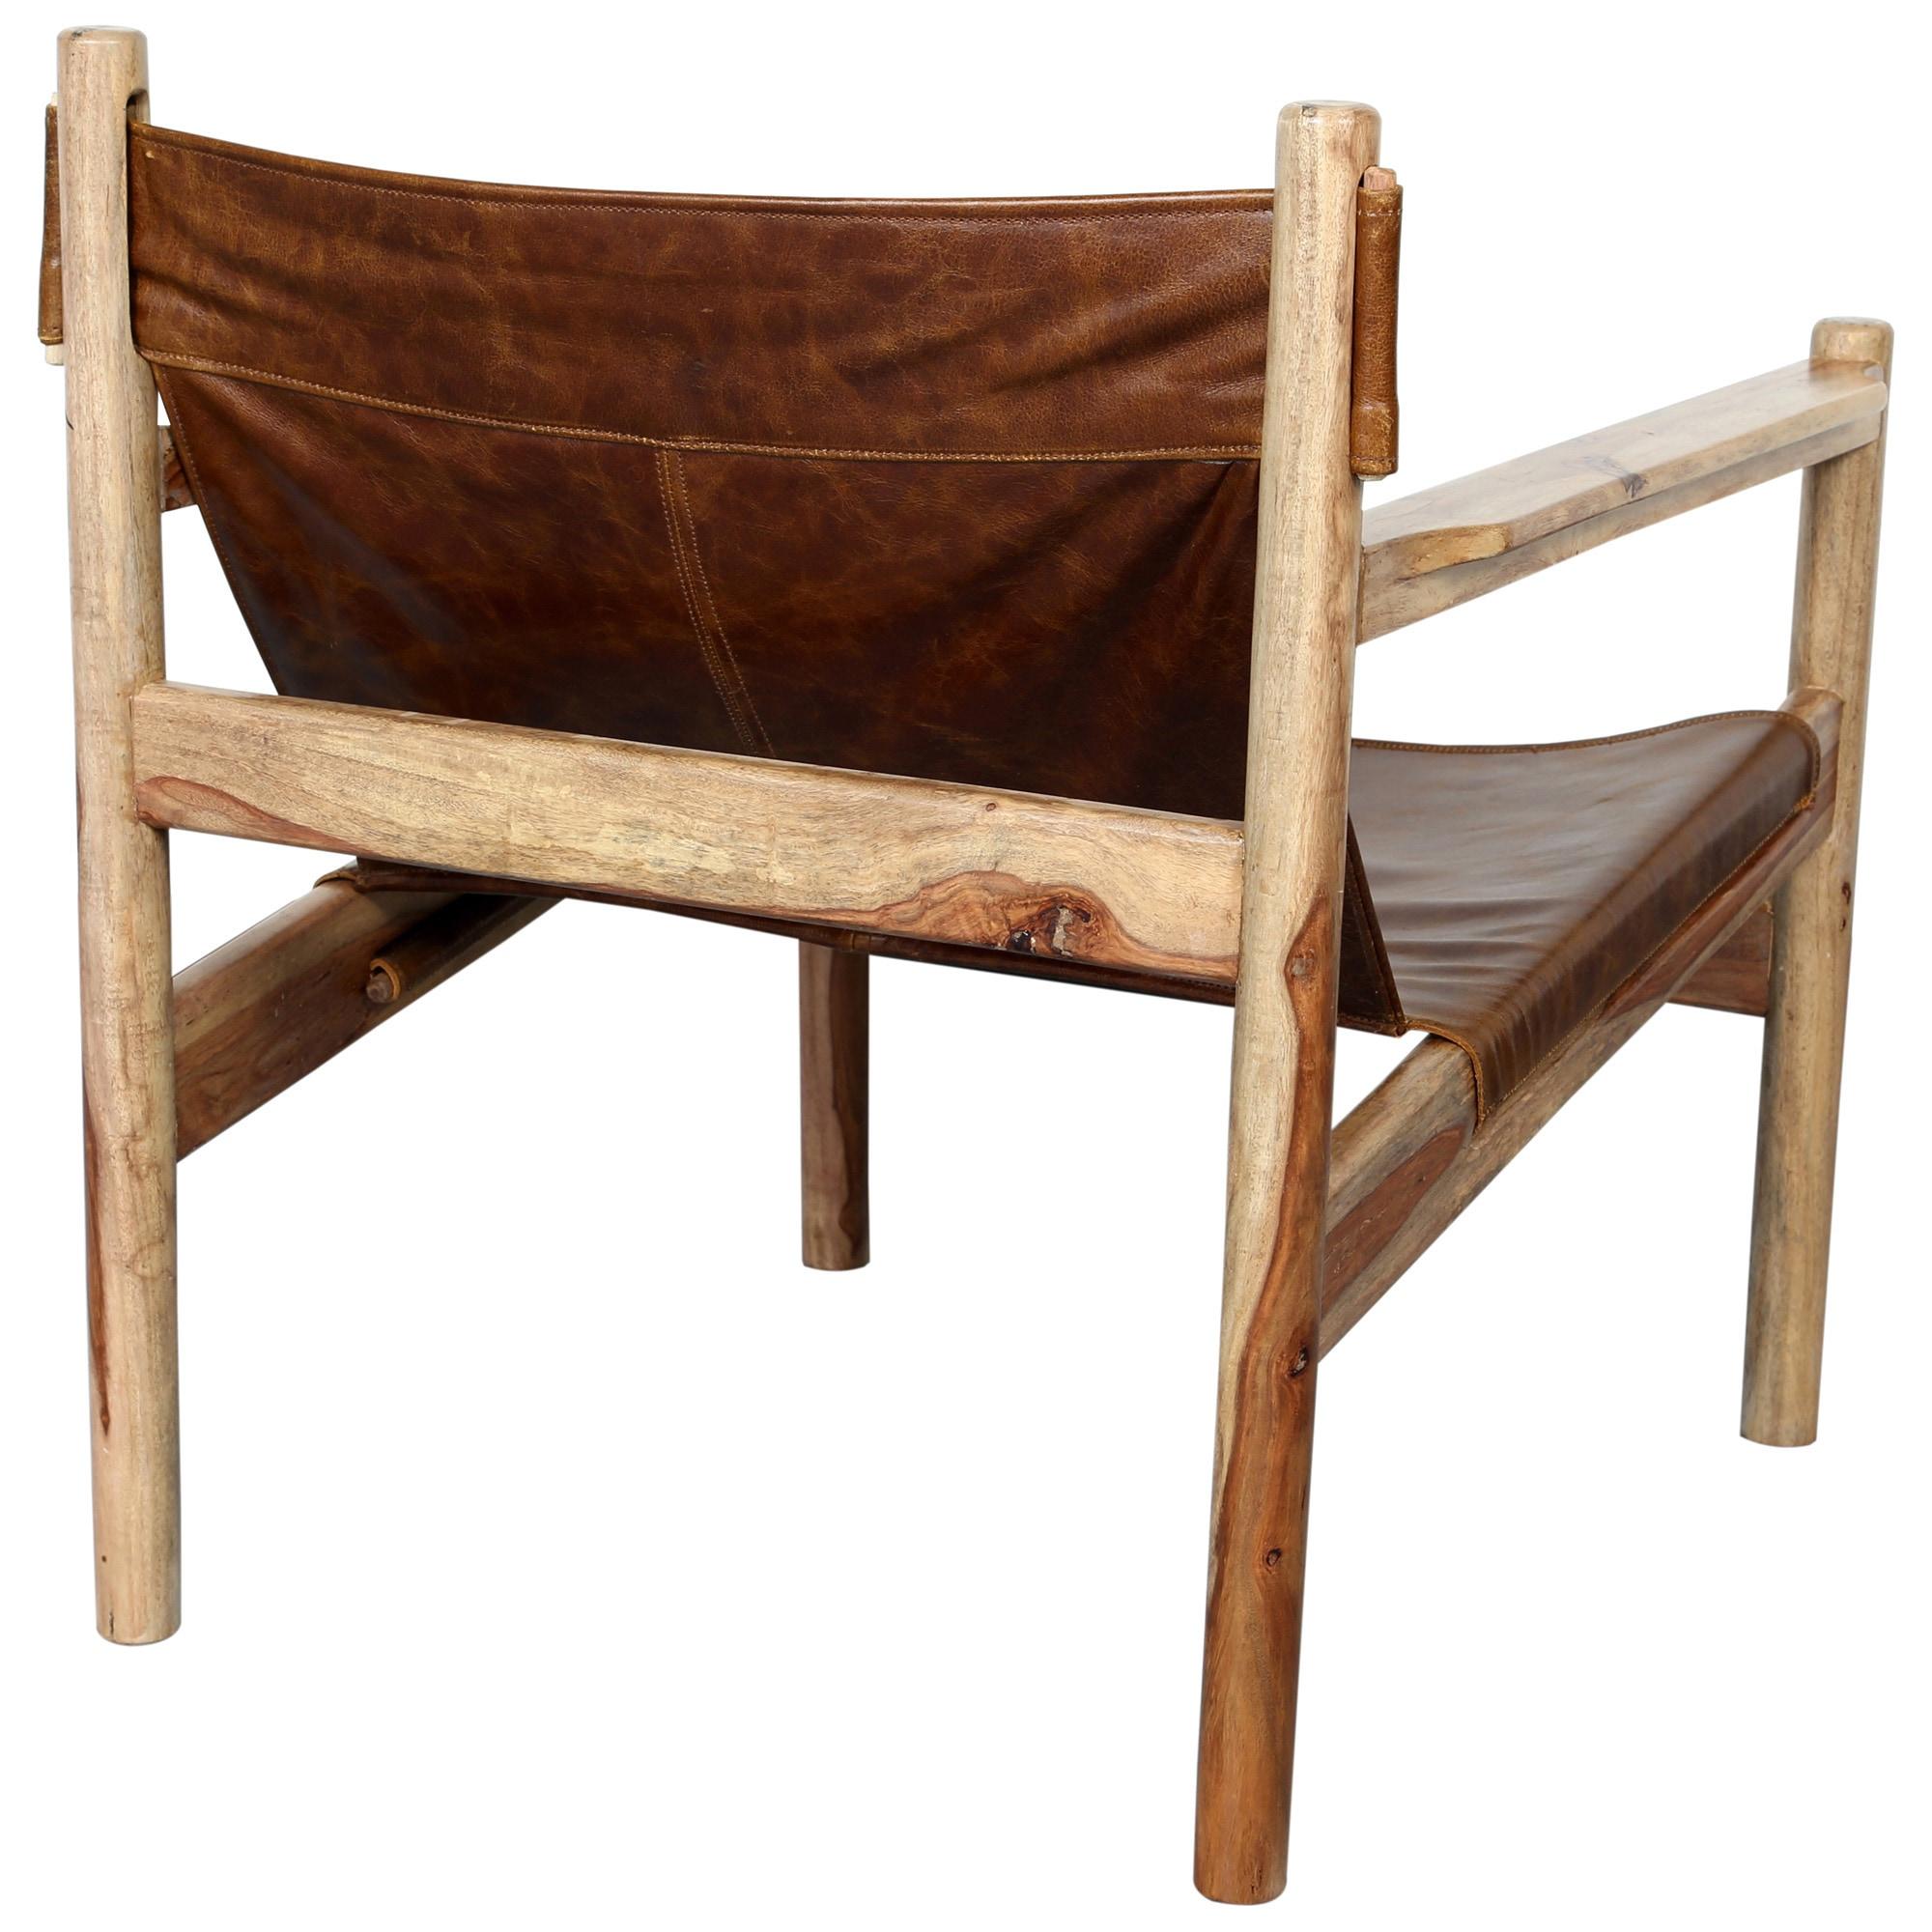 Enjoyable Handmade Genoa Sheesham And Leather Sling Chair 30 X 26 X 27 India Uwap Interior Chair Design Uwaporg